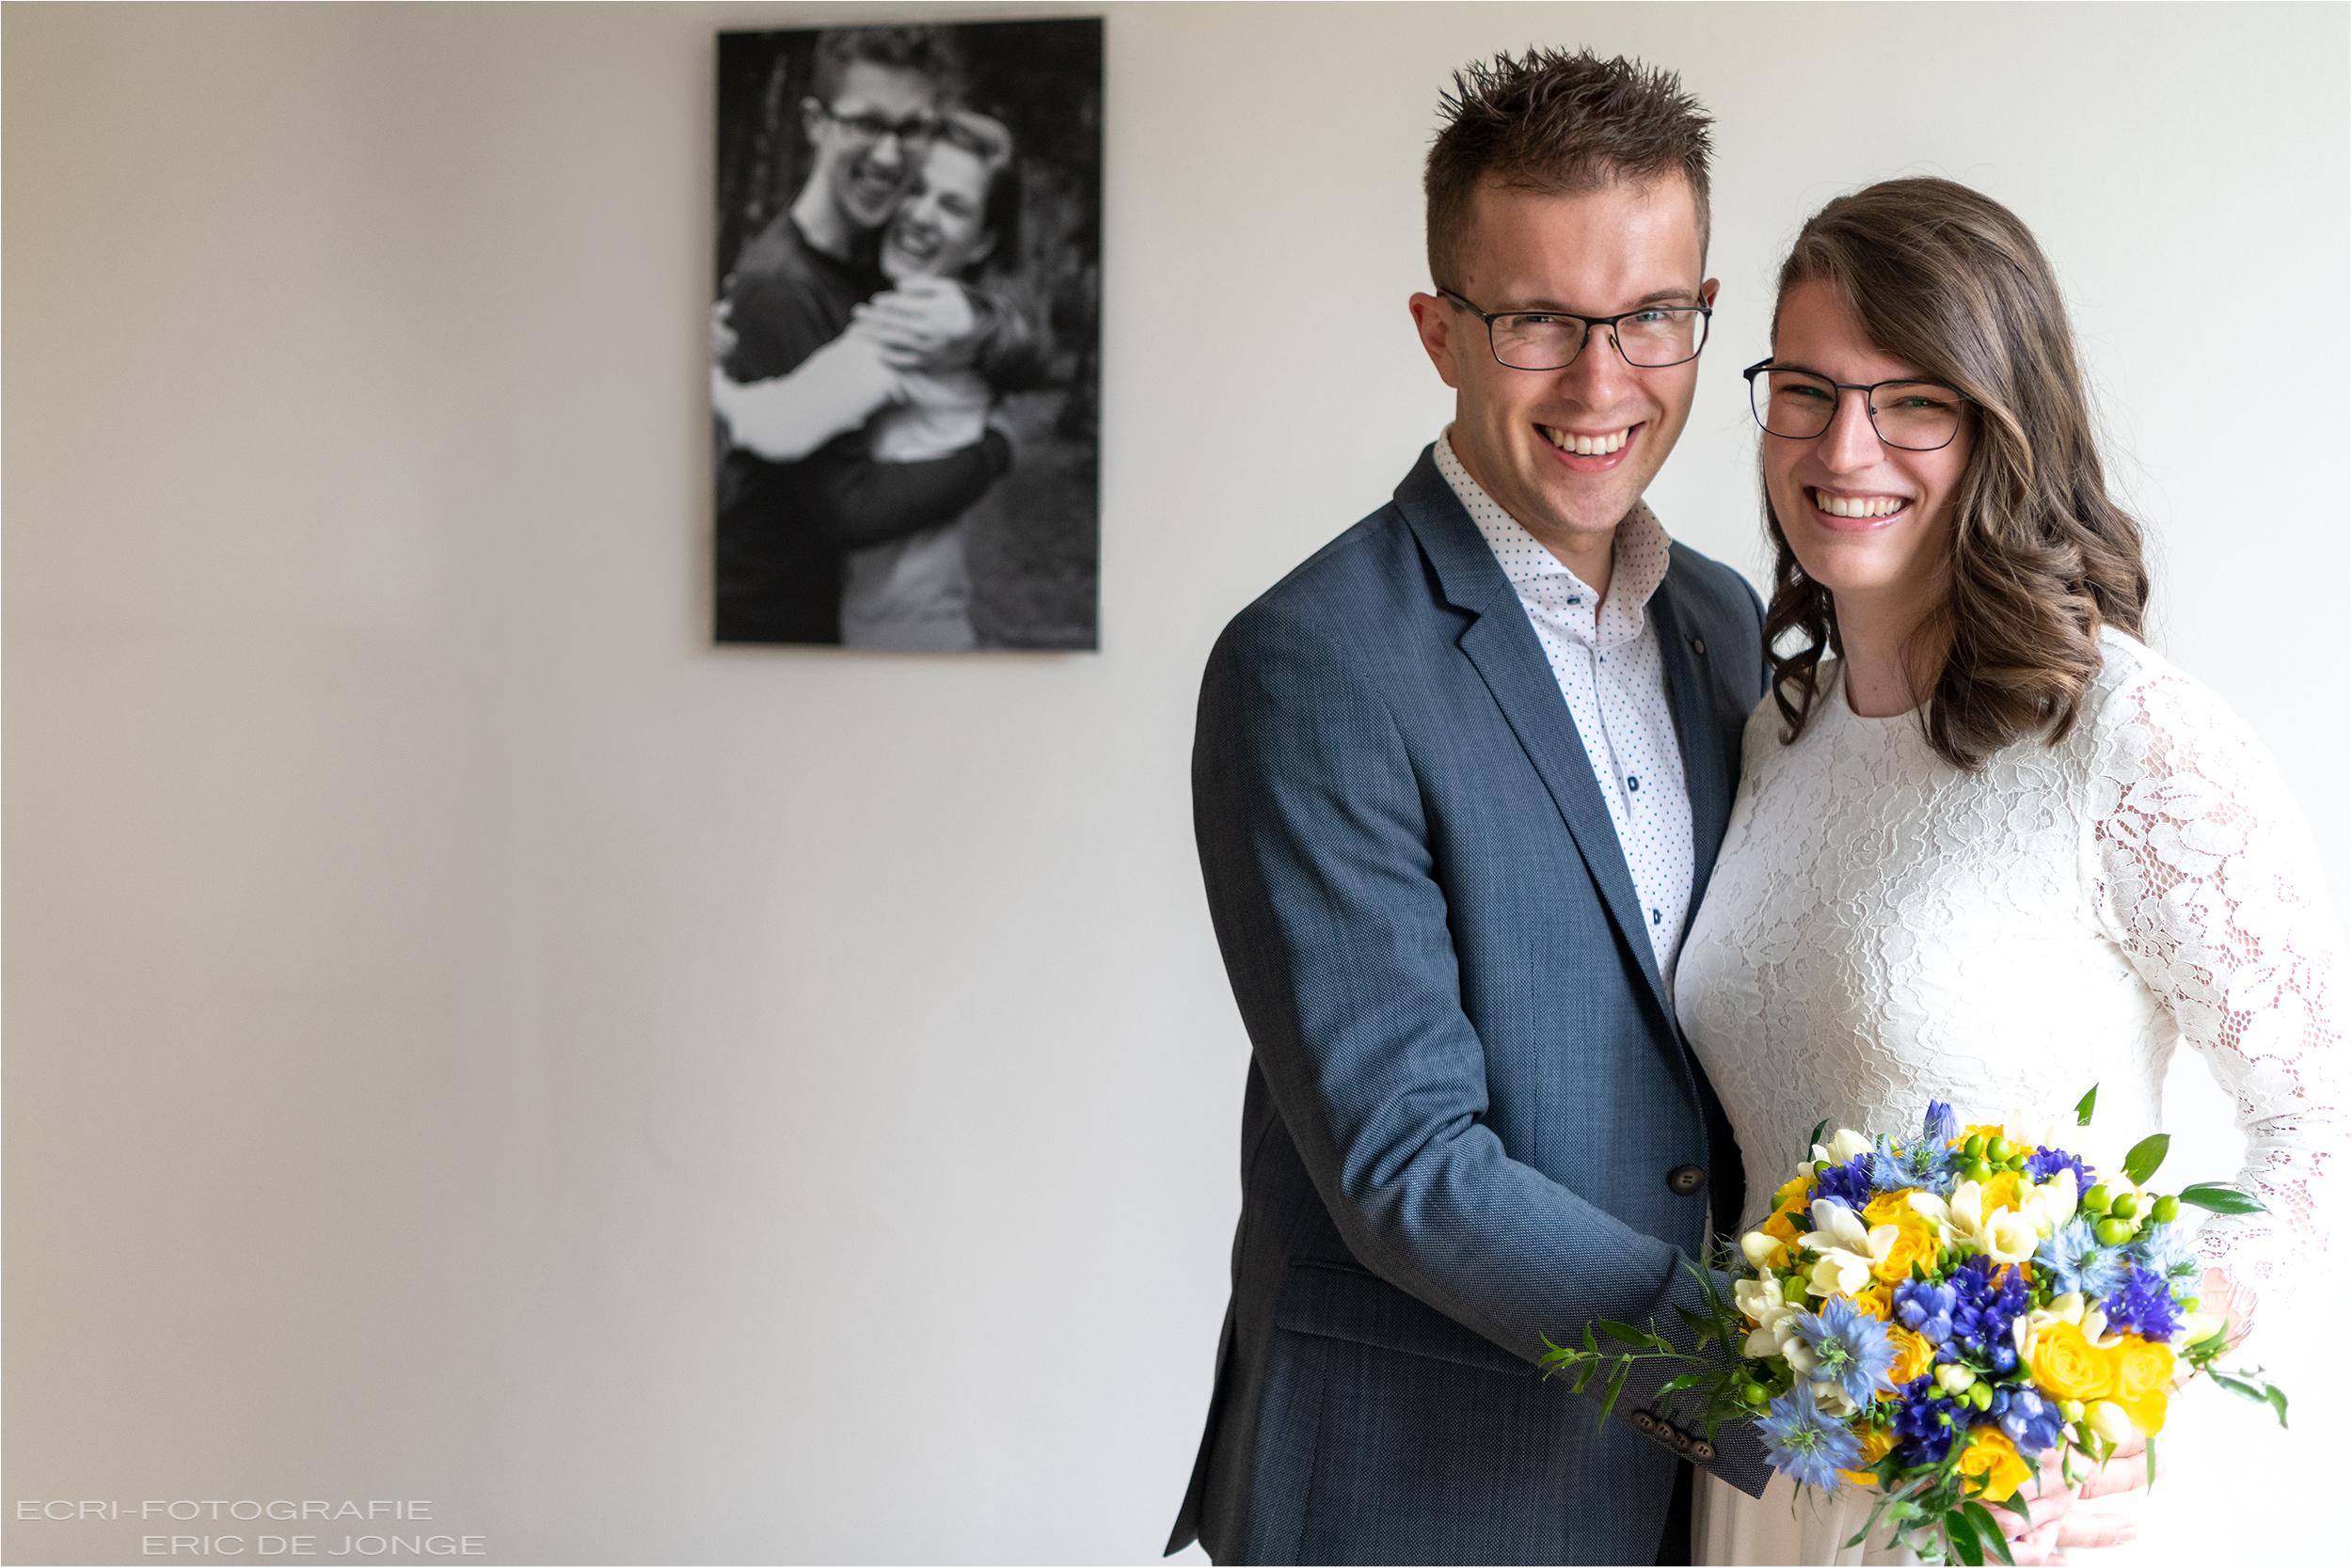 bruidsfotografie, huwelijksfotografie, ecri-fotografie, Eric de Jonge